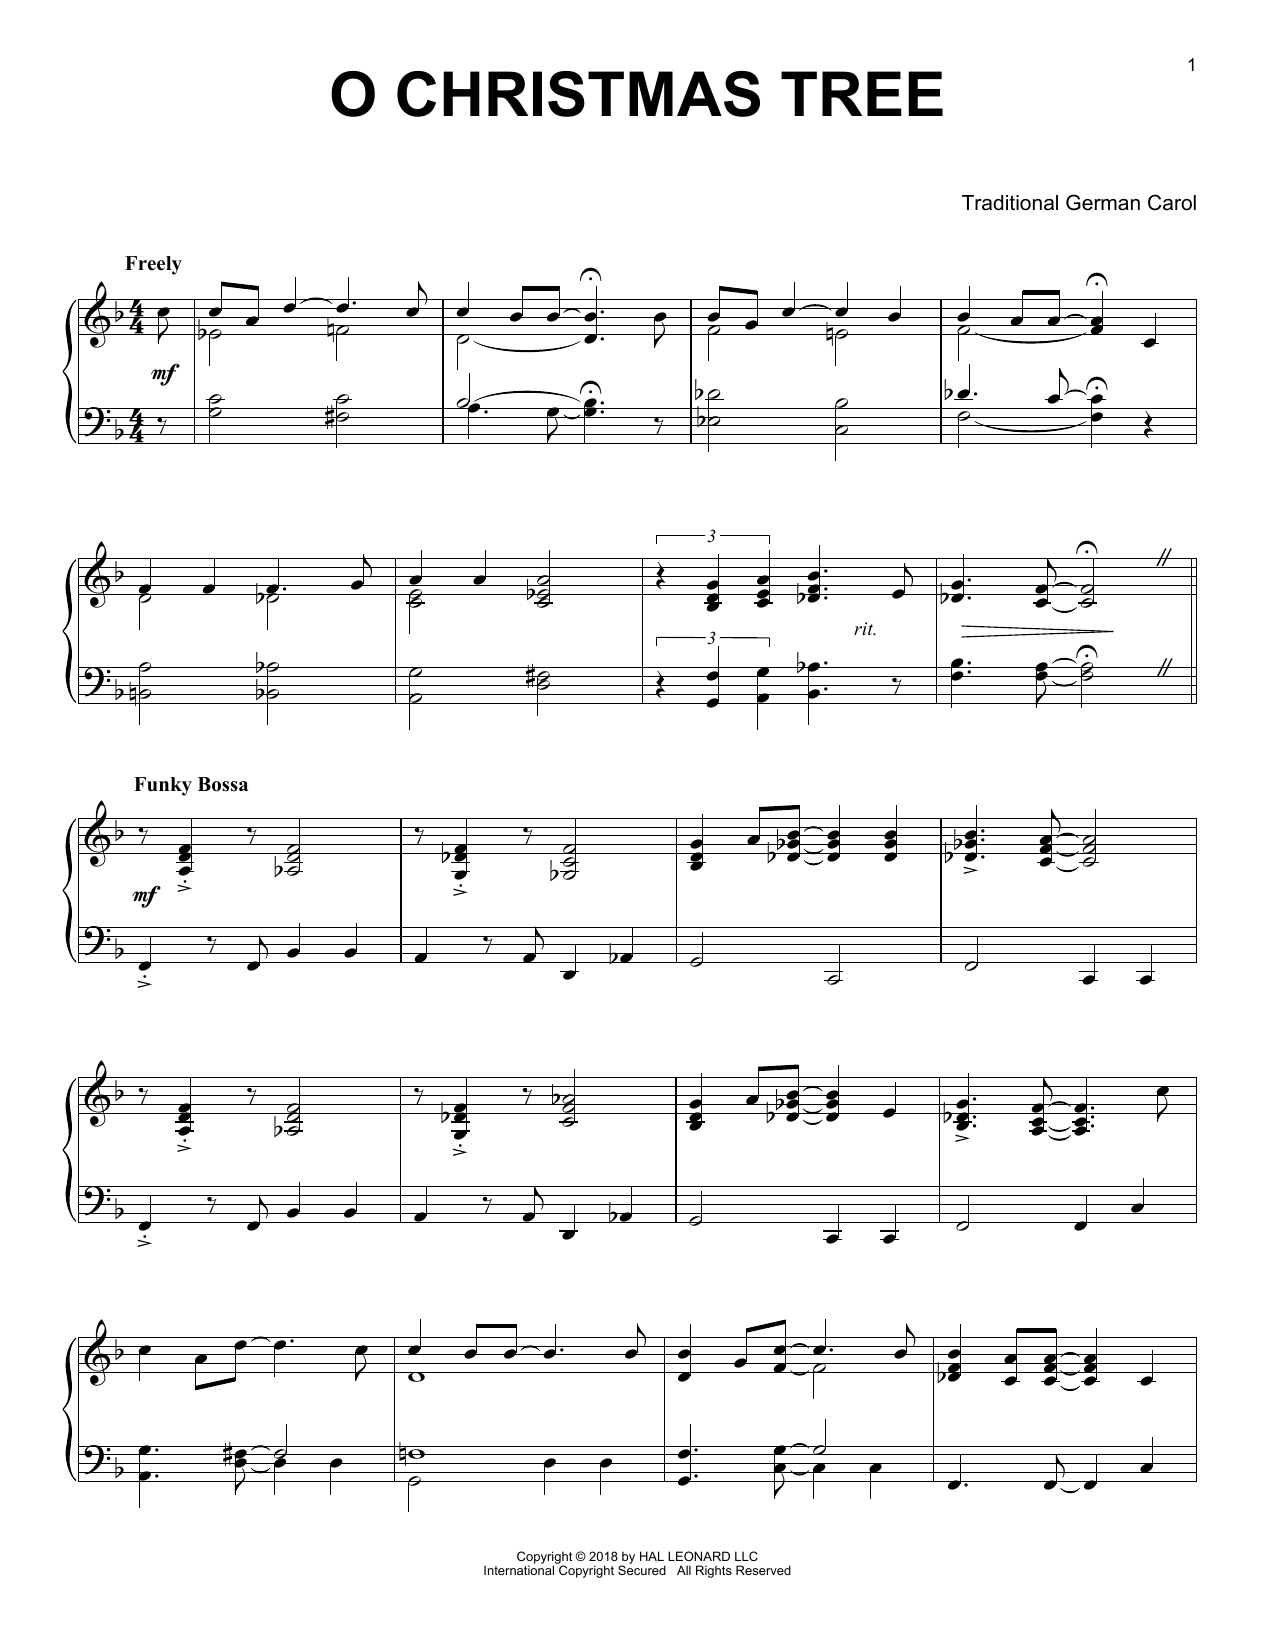 Traditional German Carol O Christmas Tree [Jazz version] sheet music notes and chords. Download Printable PDF.